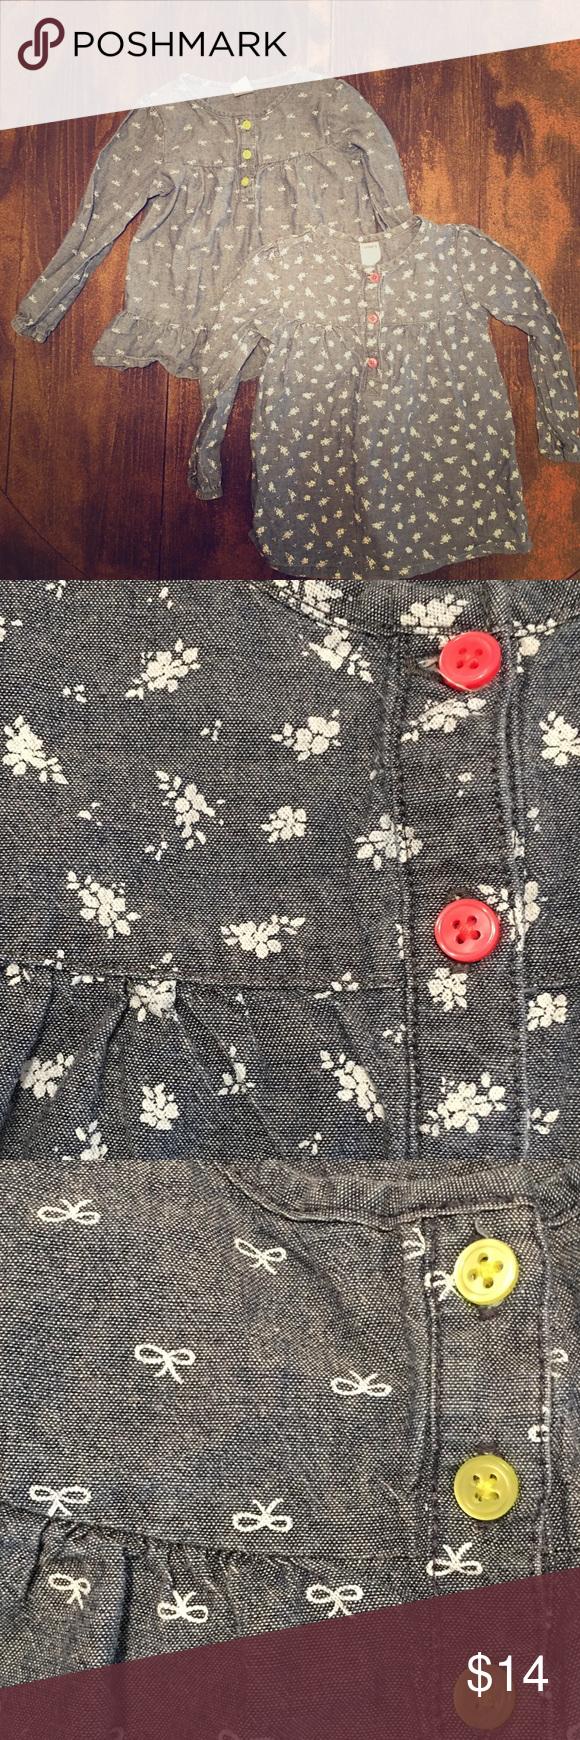 Chambray tunic shirts bundle Both size 2T Carter's Shirts & Tops Blouses